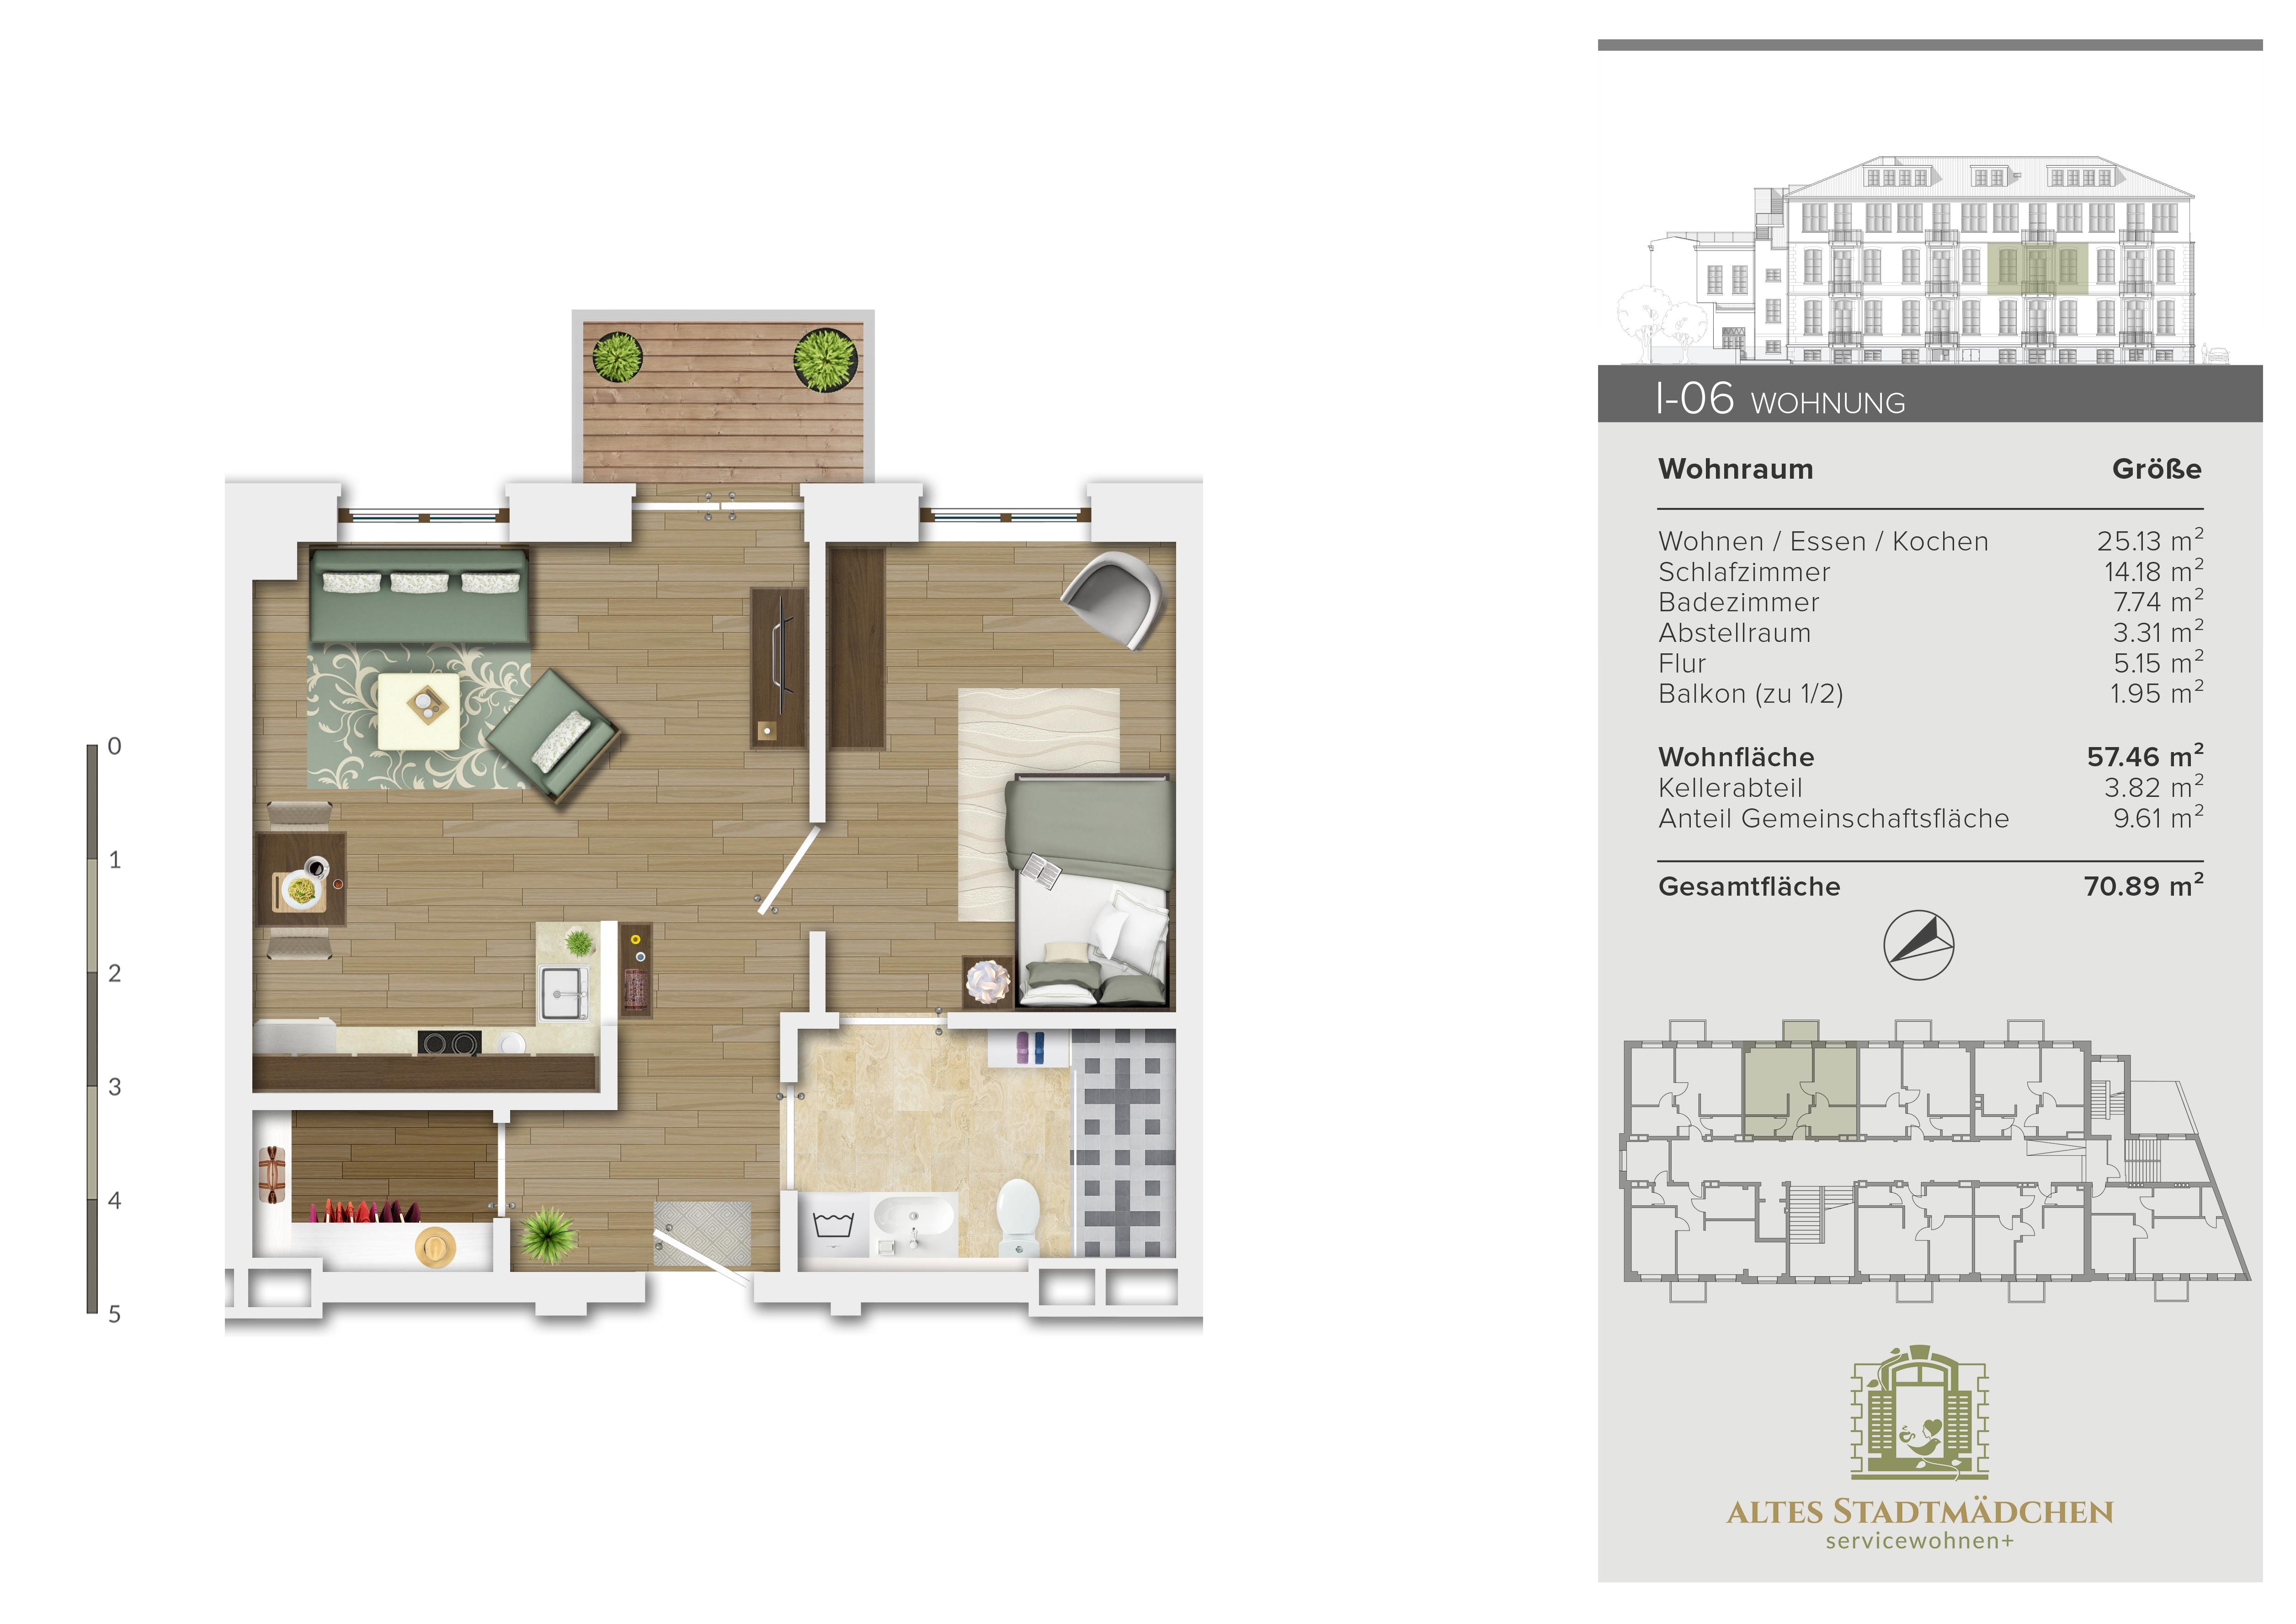 Wohnung I-06